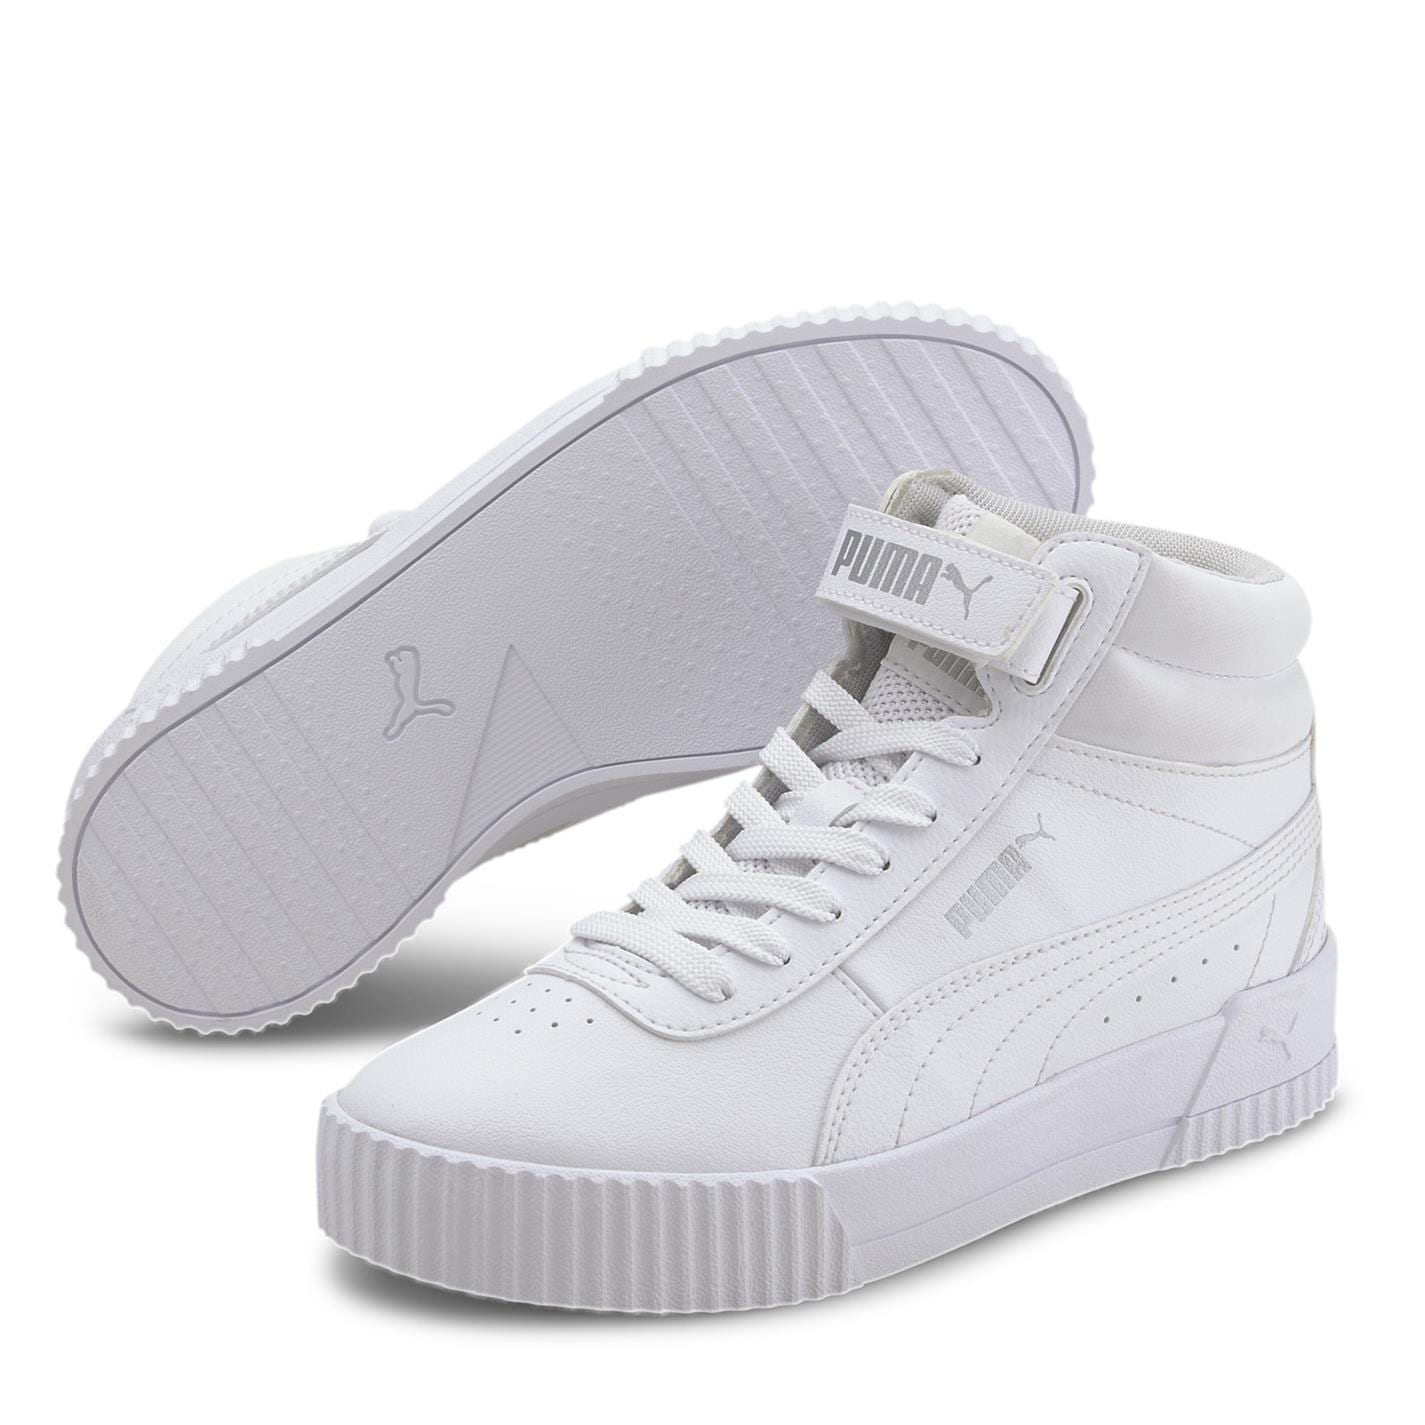 Adidasi sport Puma Carina Mid pentru fetite alb